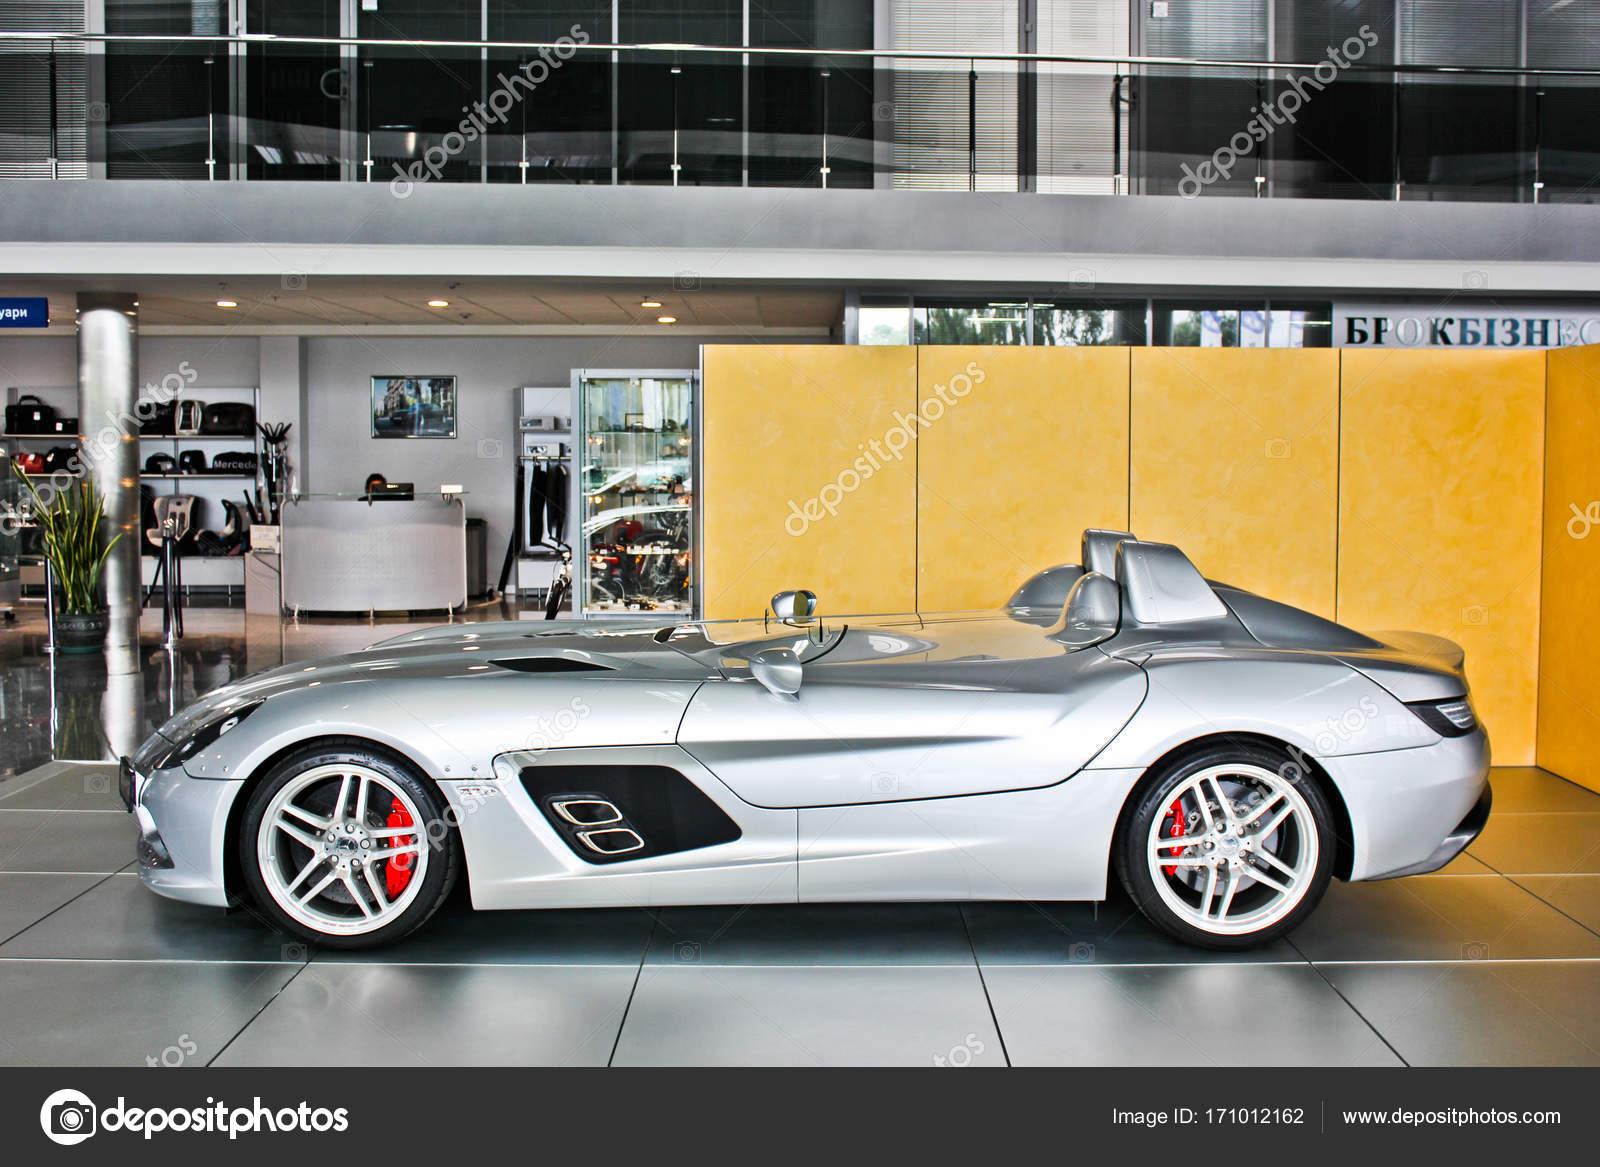 Mercedes Benz SLR McLaren Stirling Moss. AMG